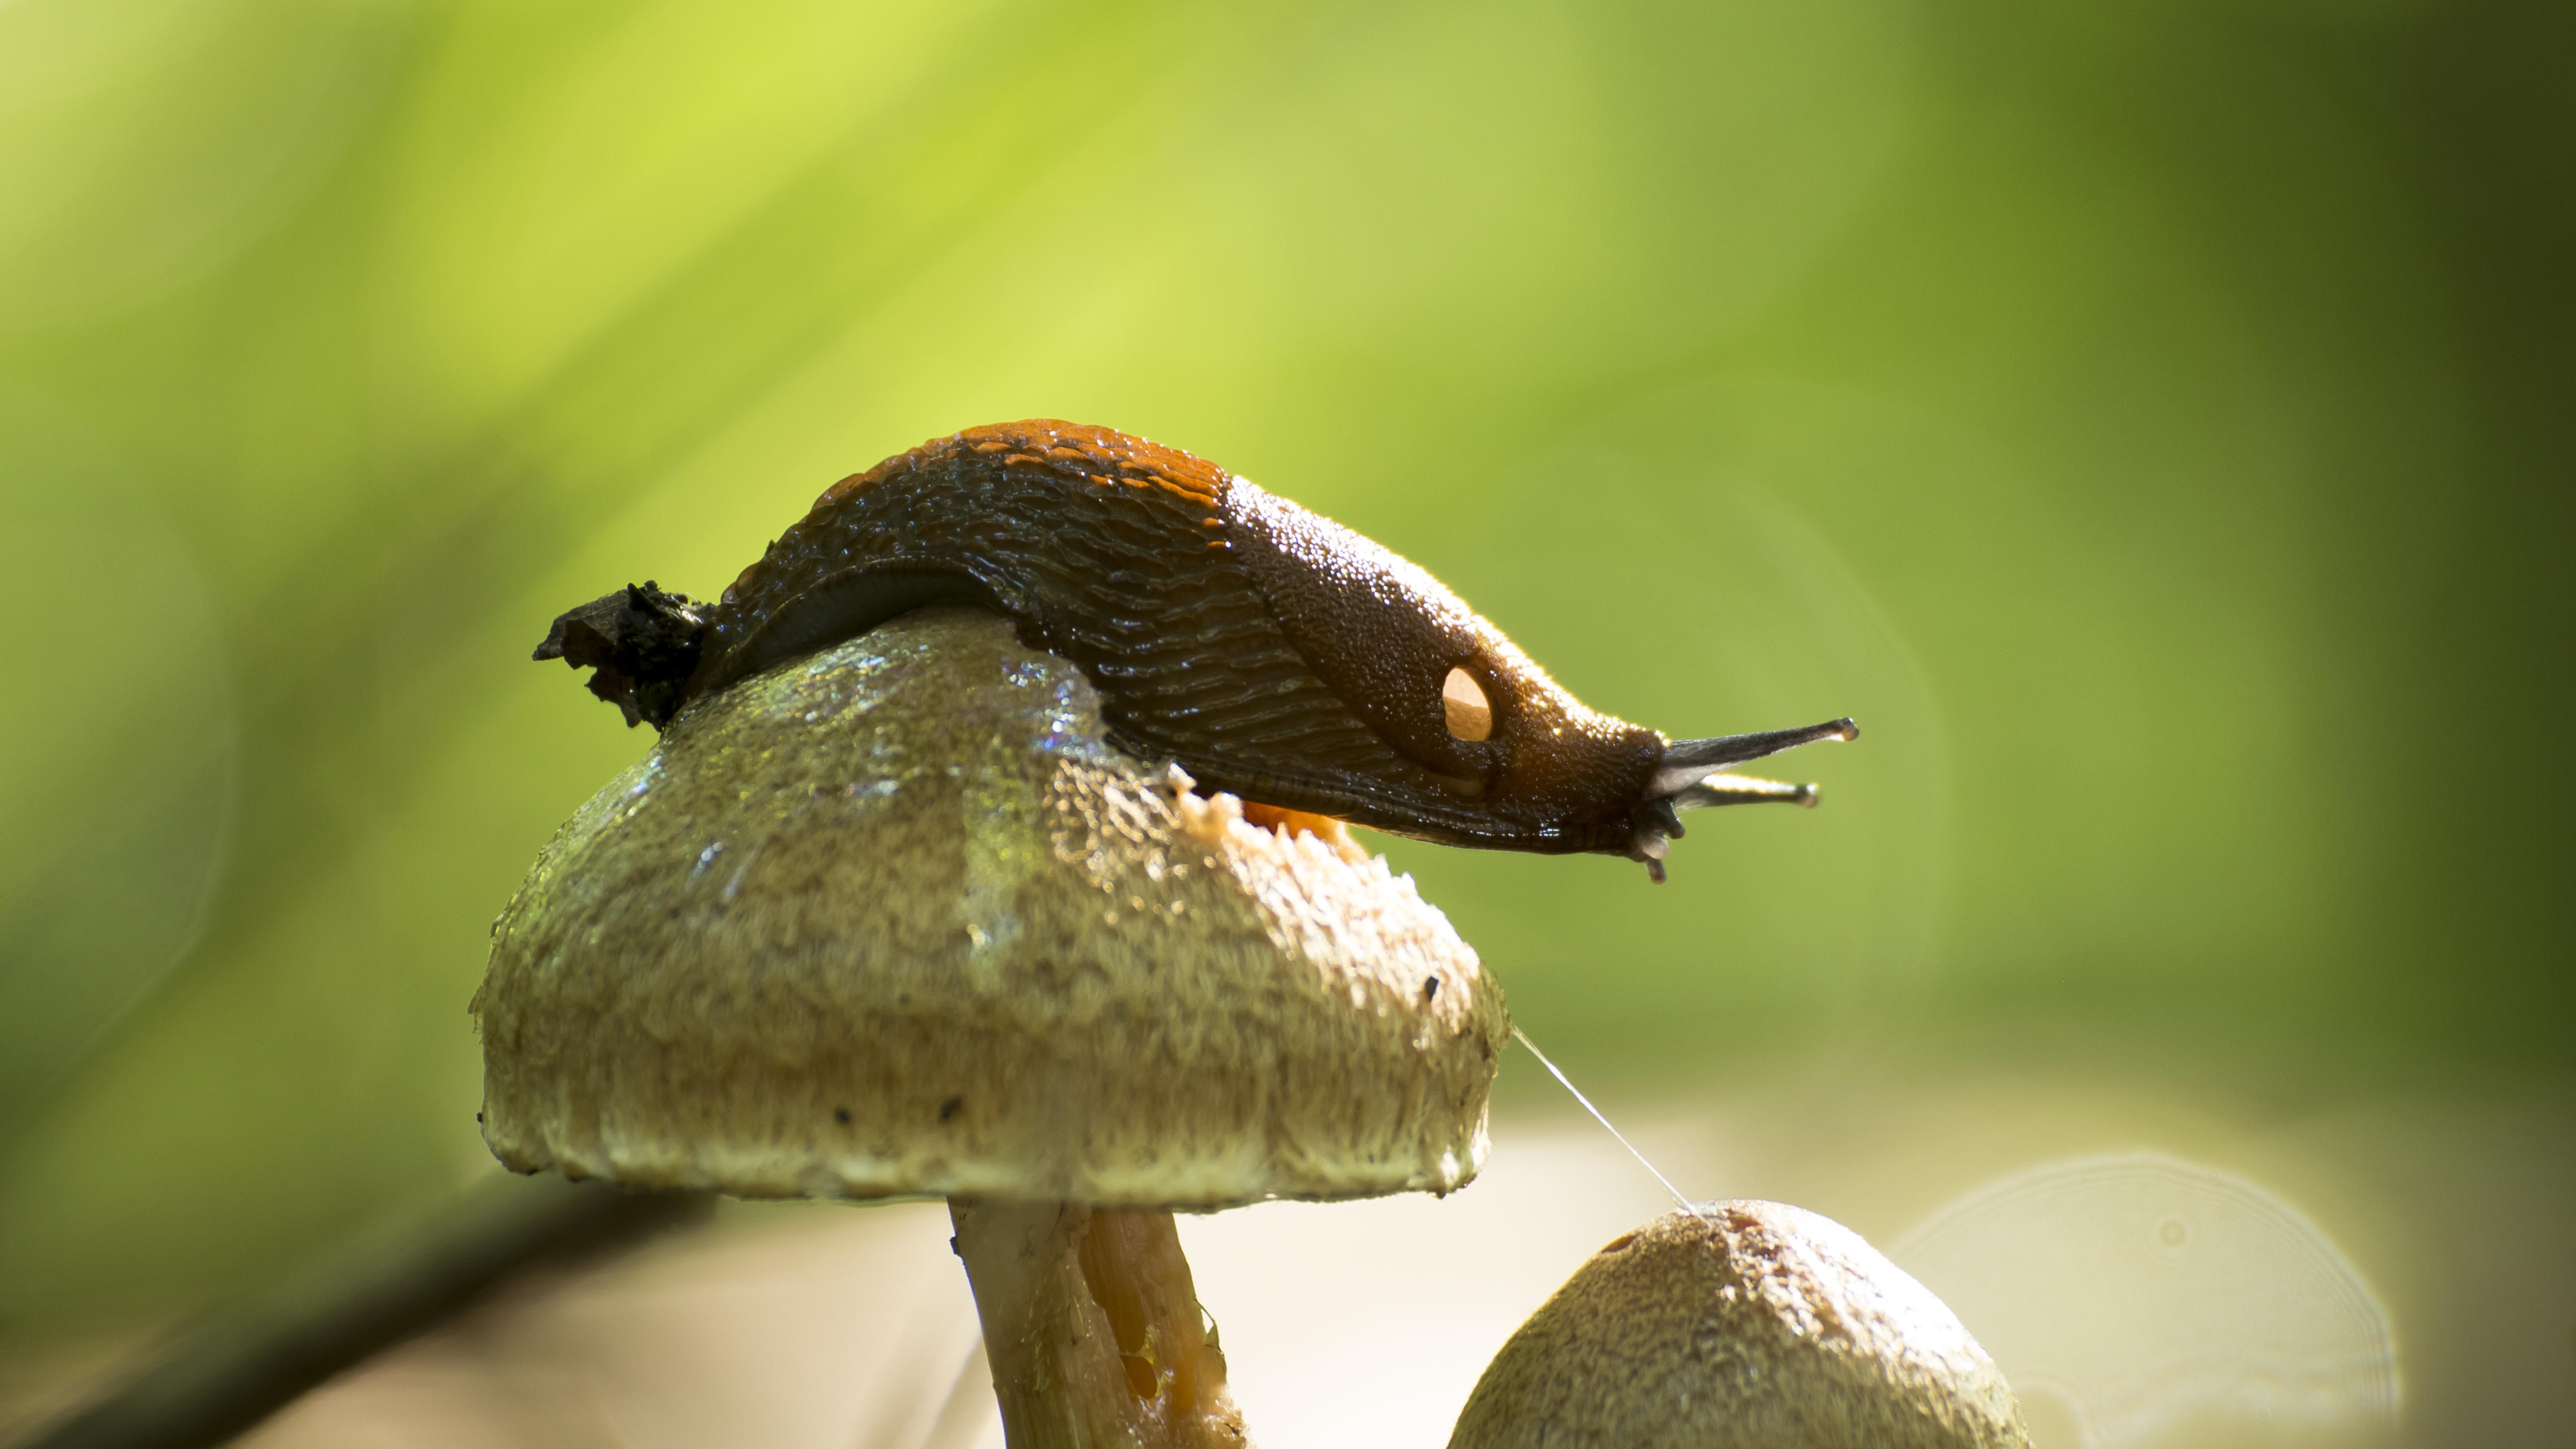 Slug climbing Mushroom by Danimatie